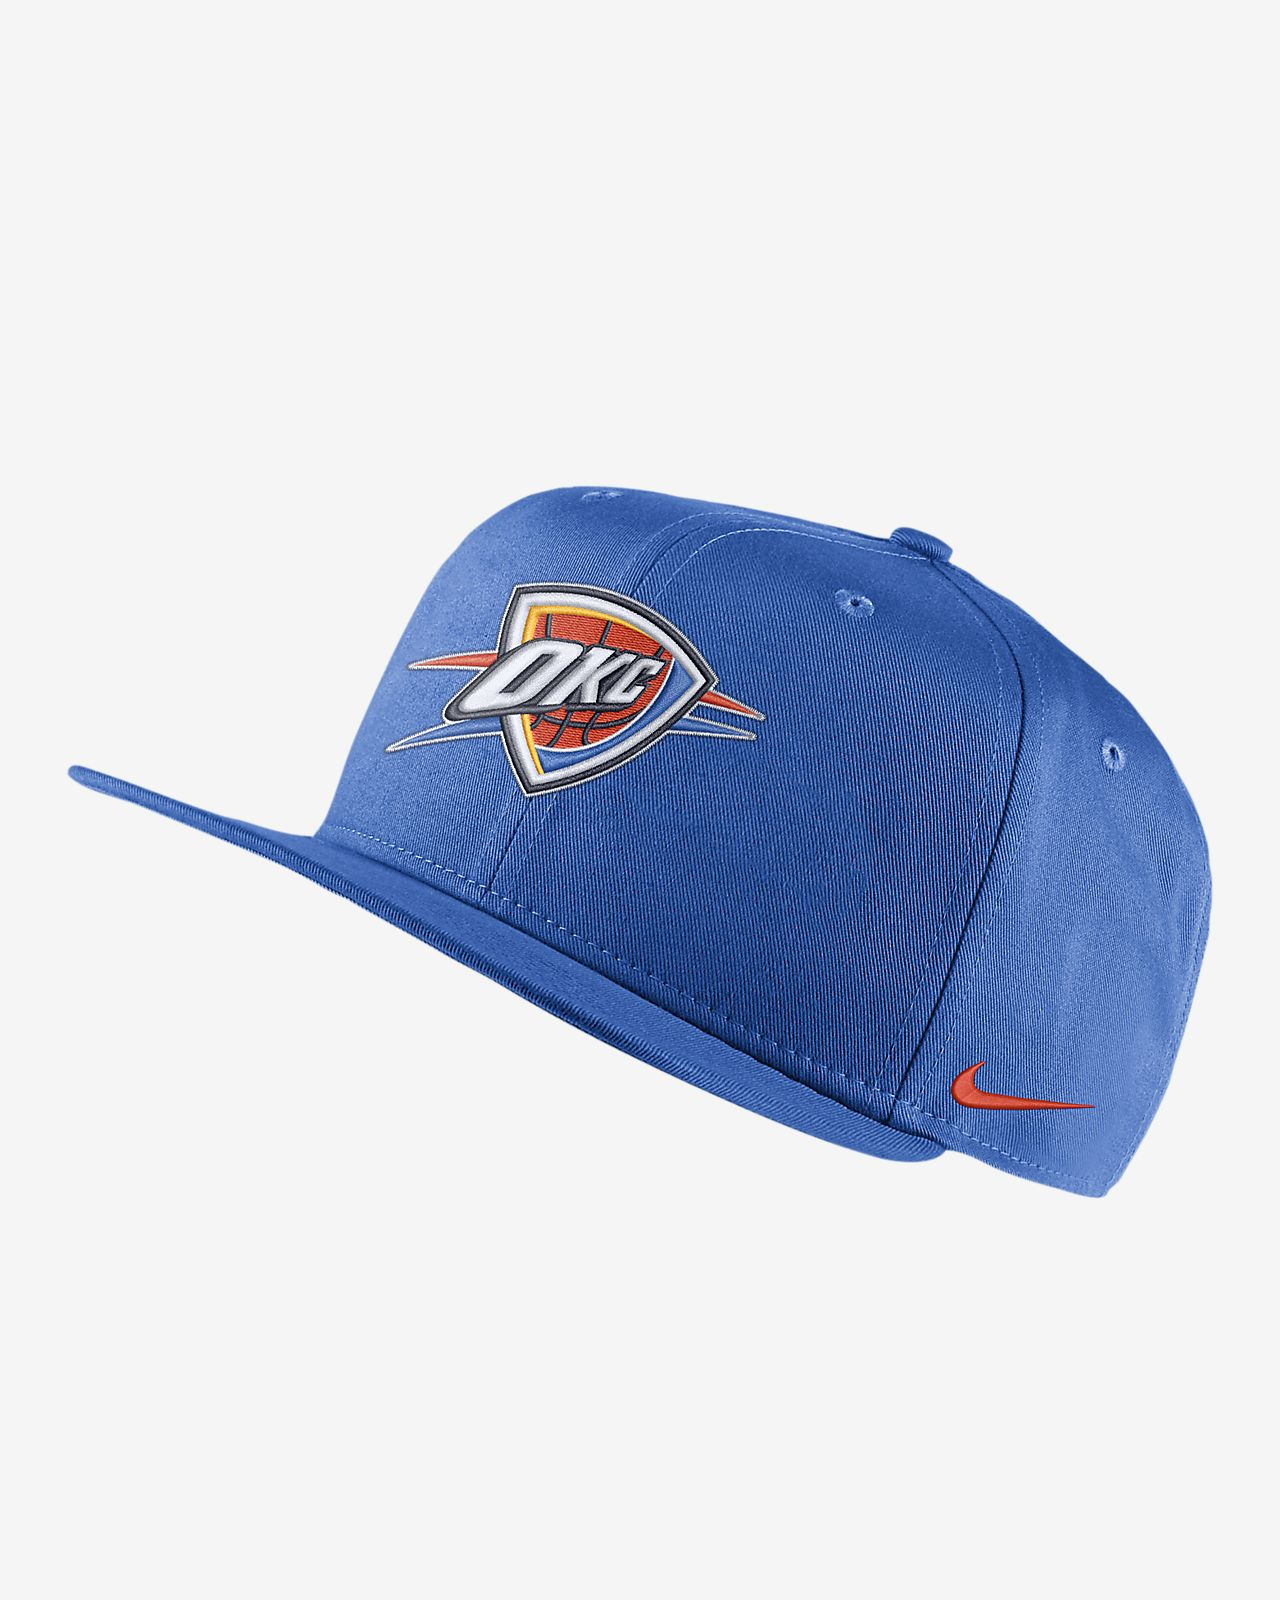 Oklahoma City Thunder Nike Pro Gorra de l'NBA